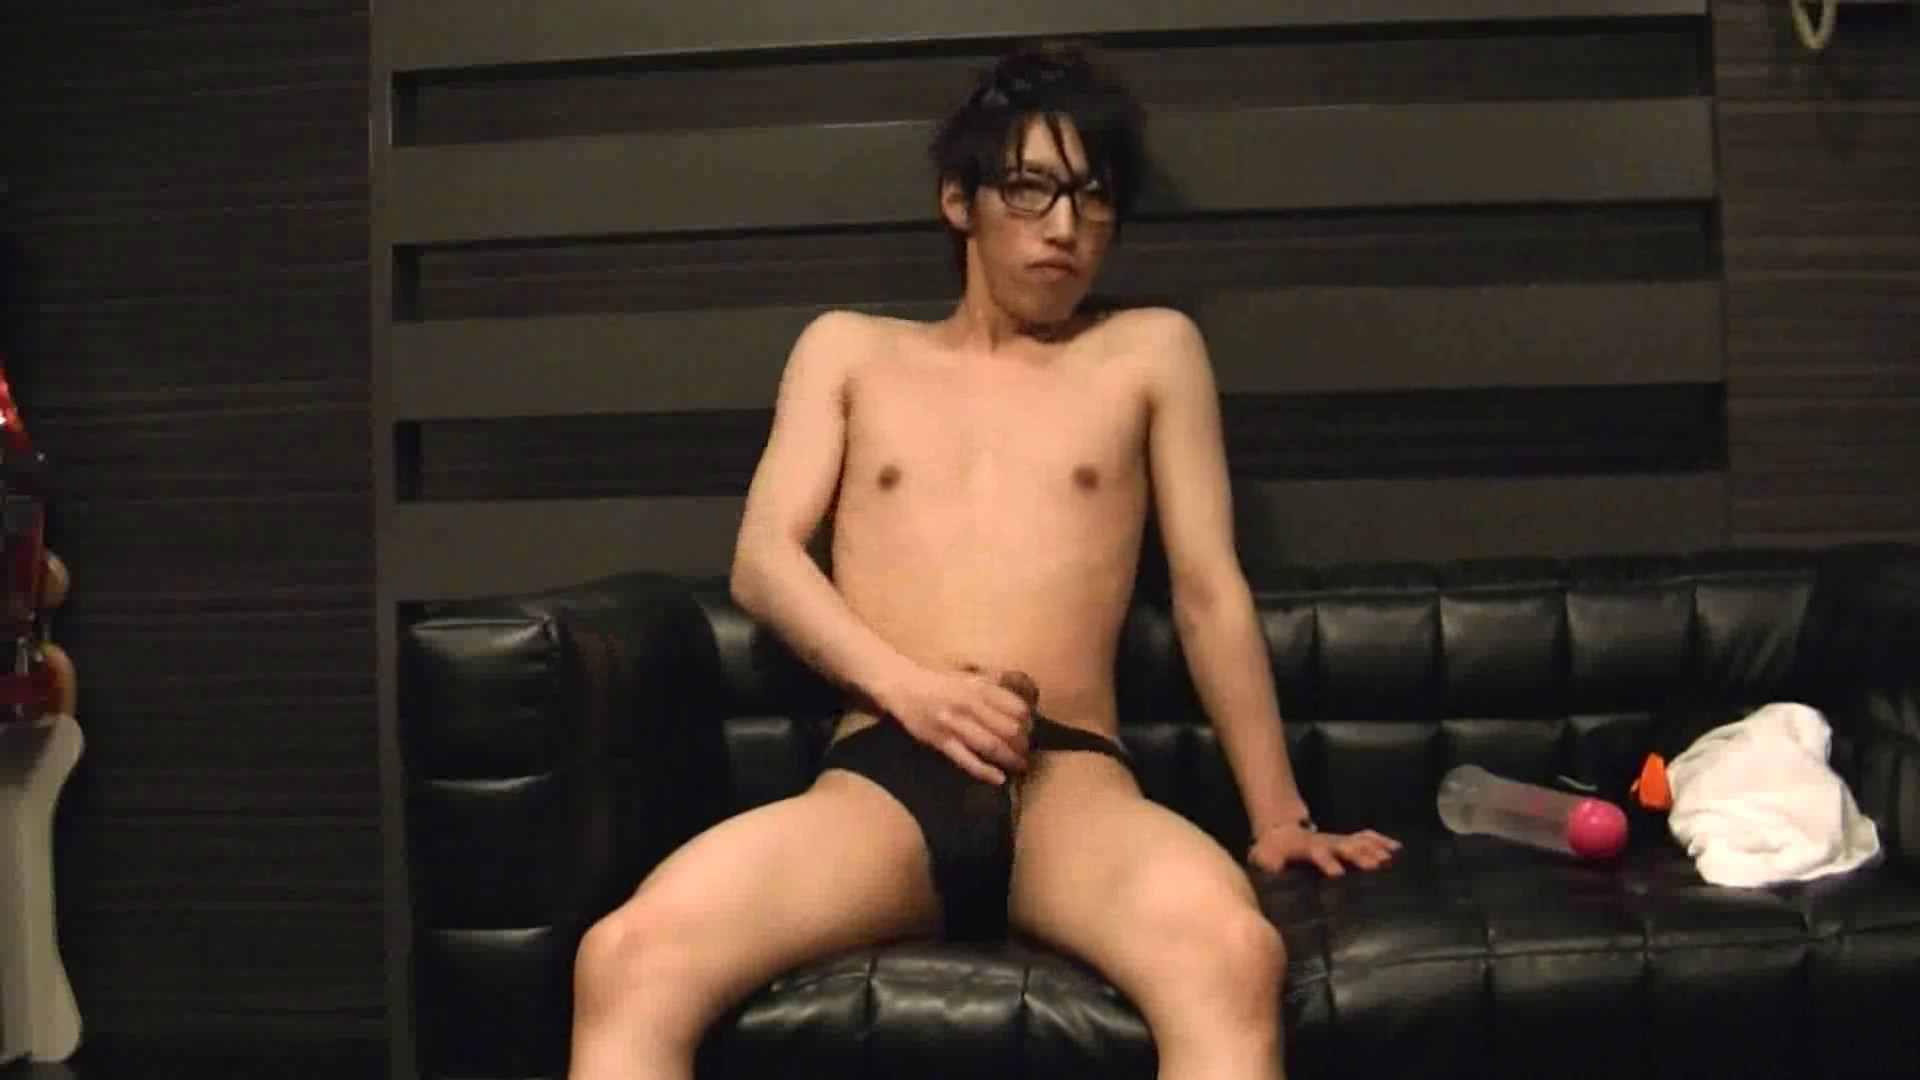 ONA見せカーニバル!! Vol3 男・男 ゲイ無料無修正画像 72pic 30